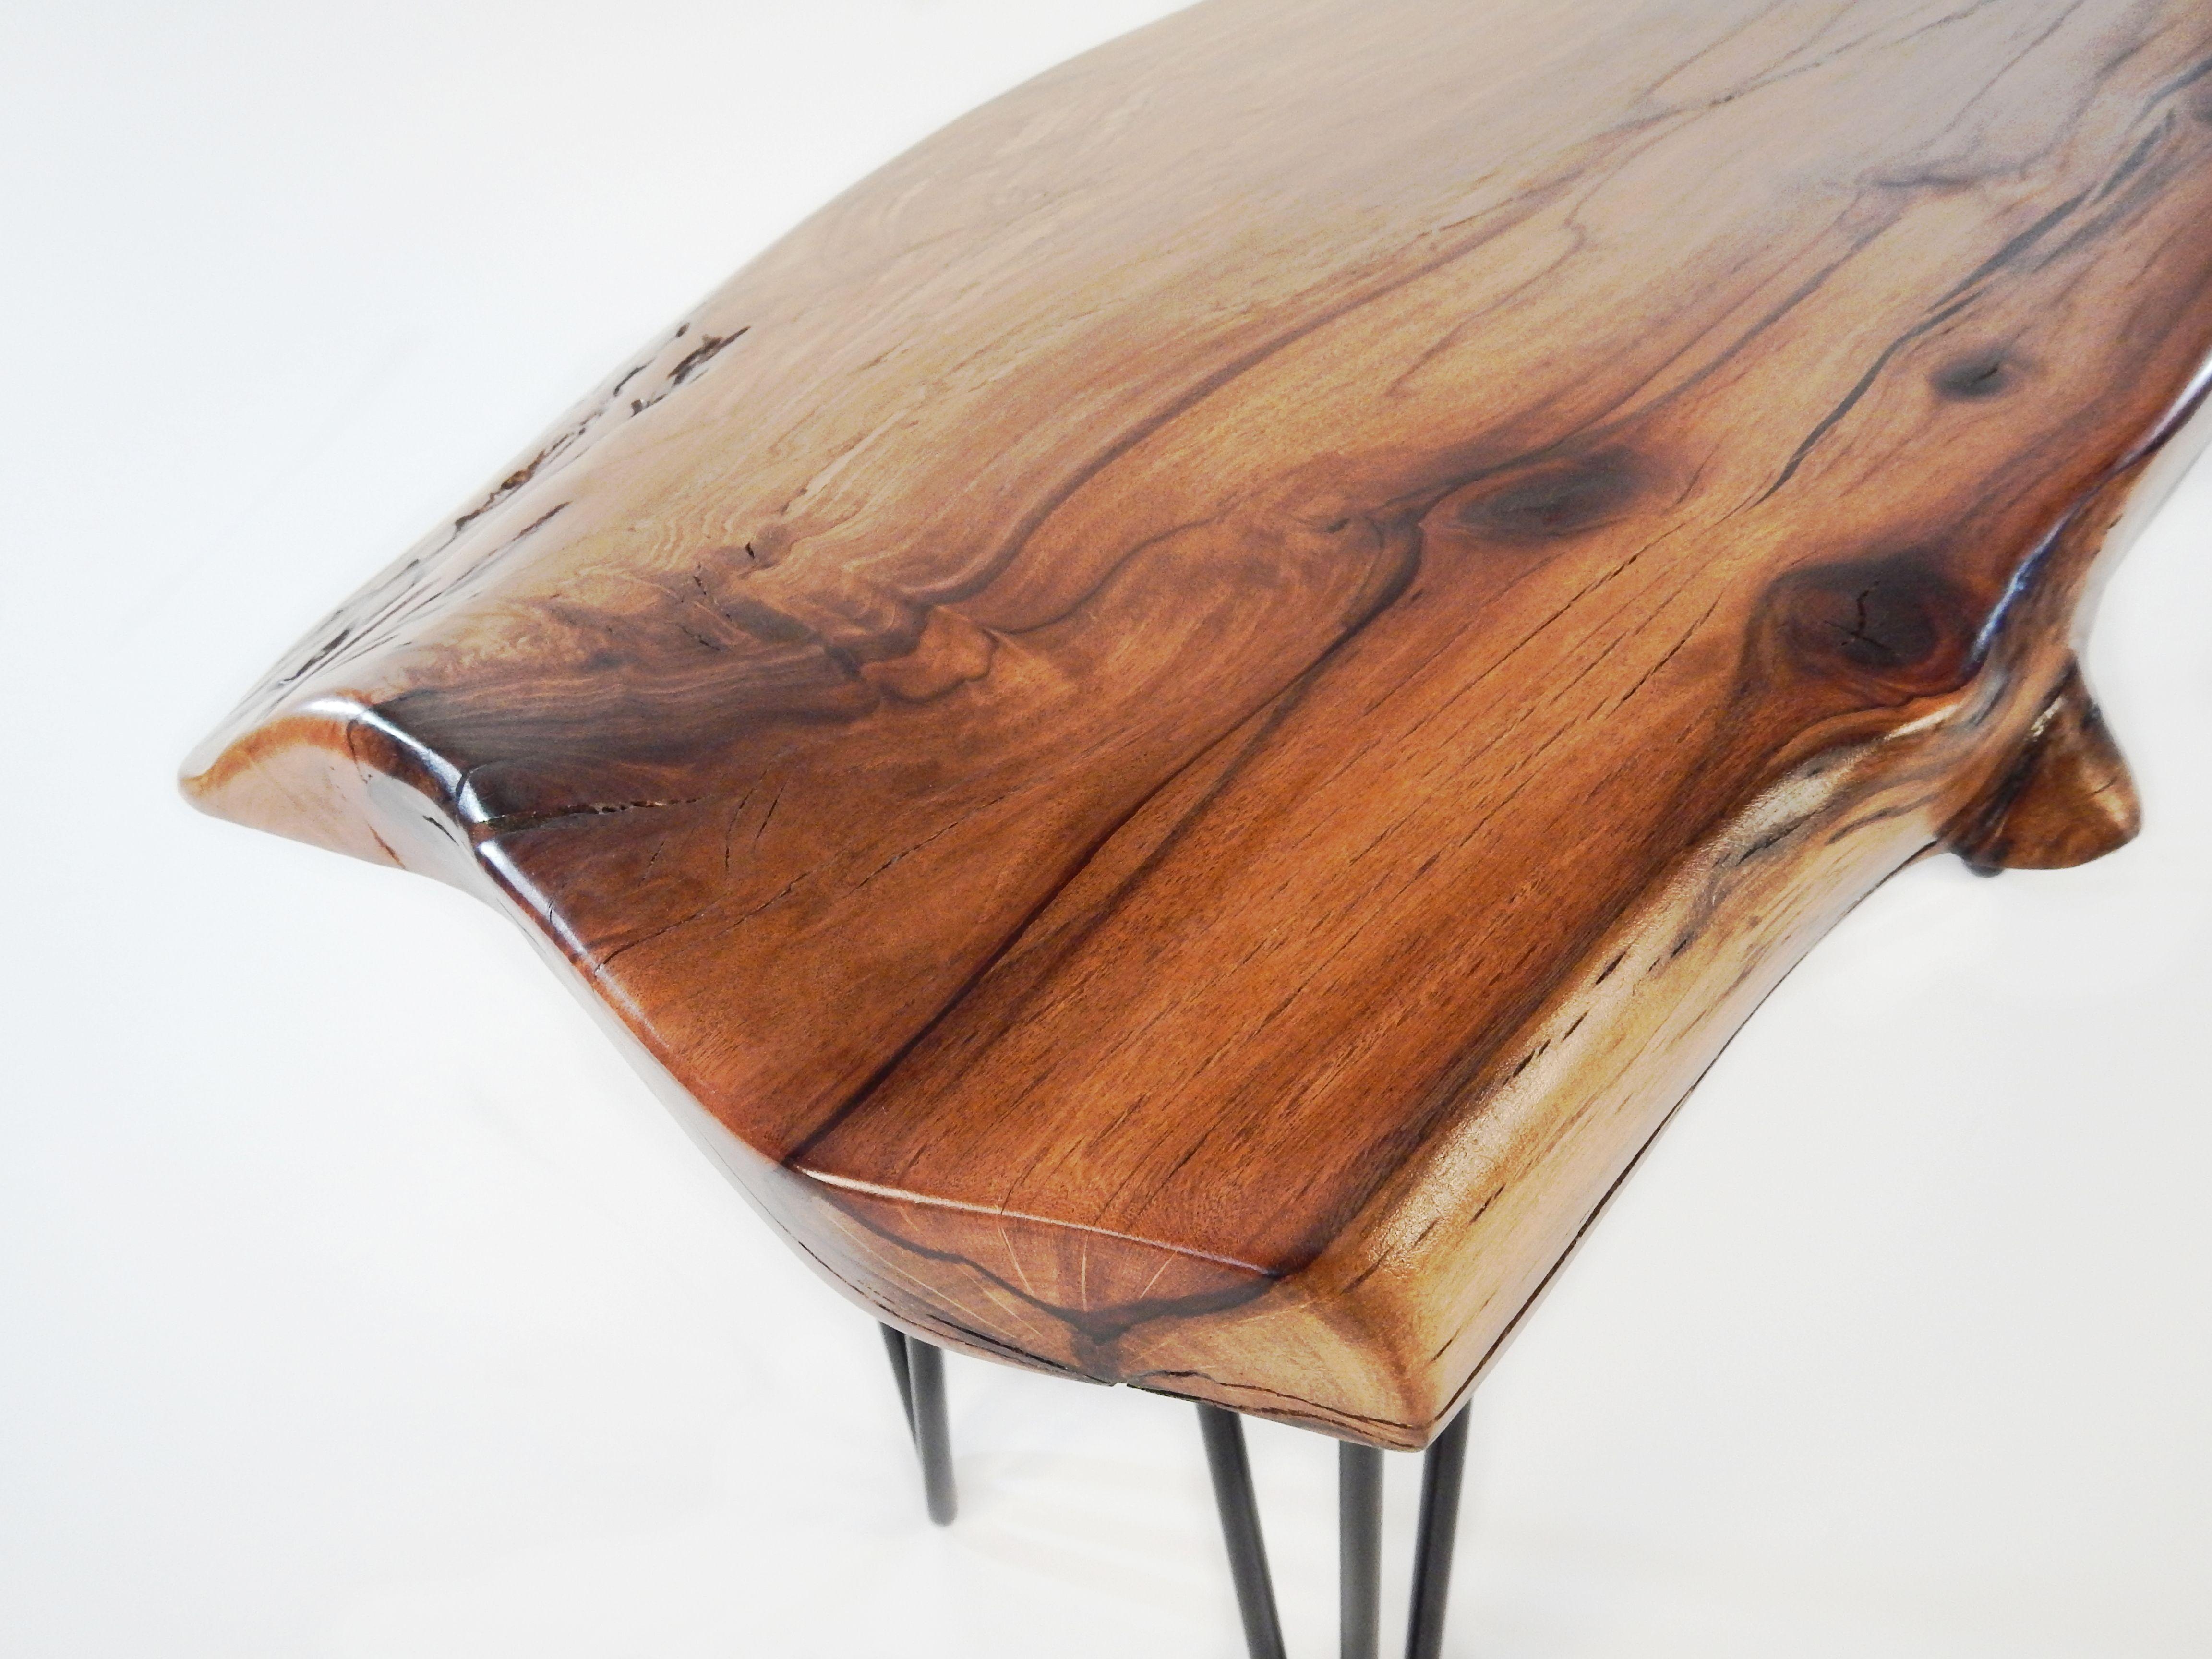 Hand Made Live Edge Australian Beefwood Coffee Table by Vantz Furniture  CustomMade.com